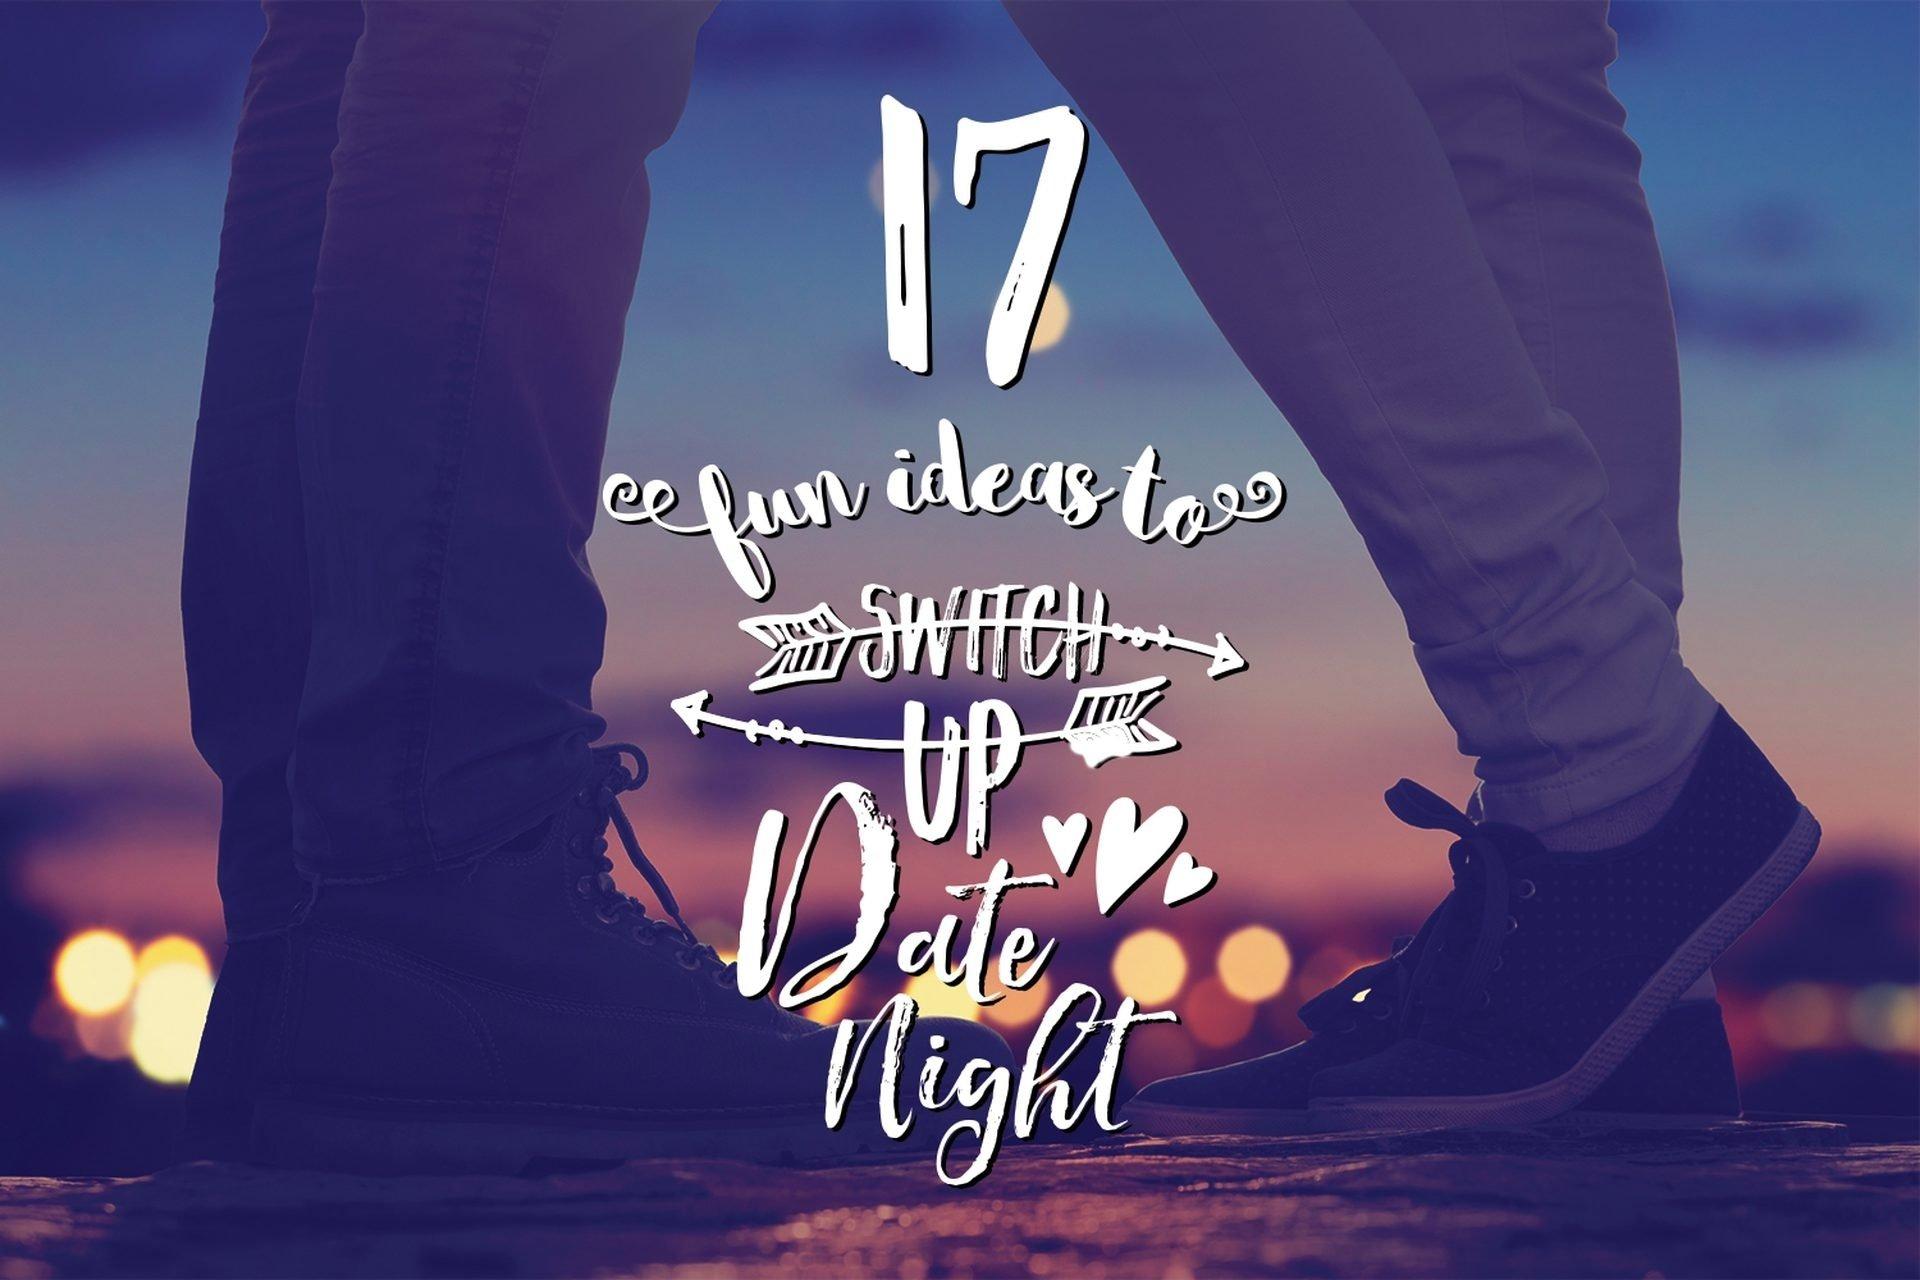 10 Stylish Fun Date Ideas San Diego 17 fun ideas to shake up date night livestrong 1 2020